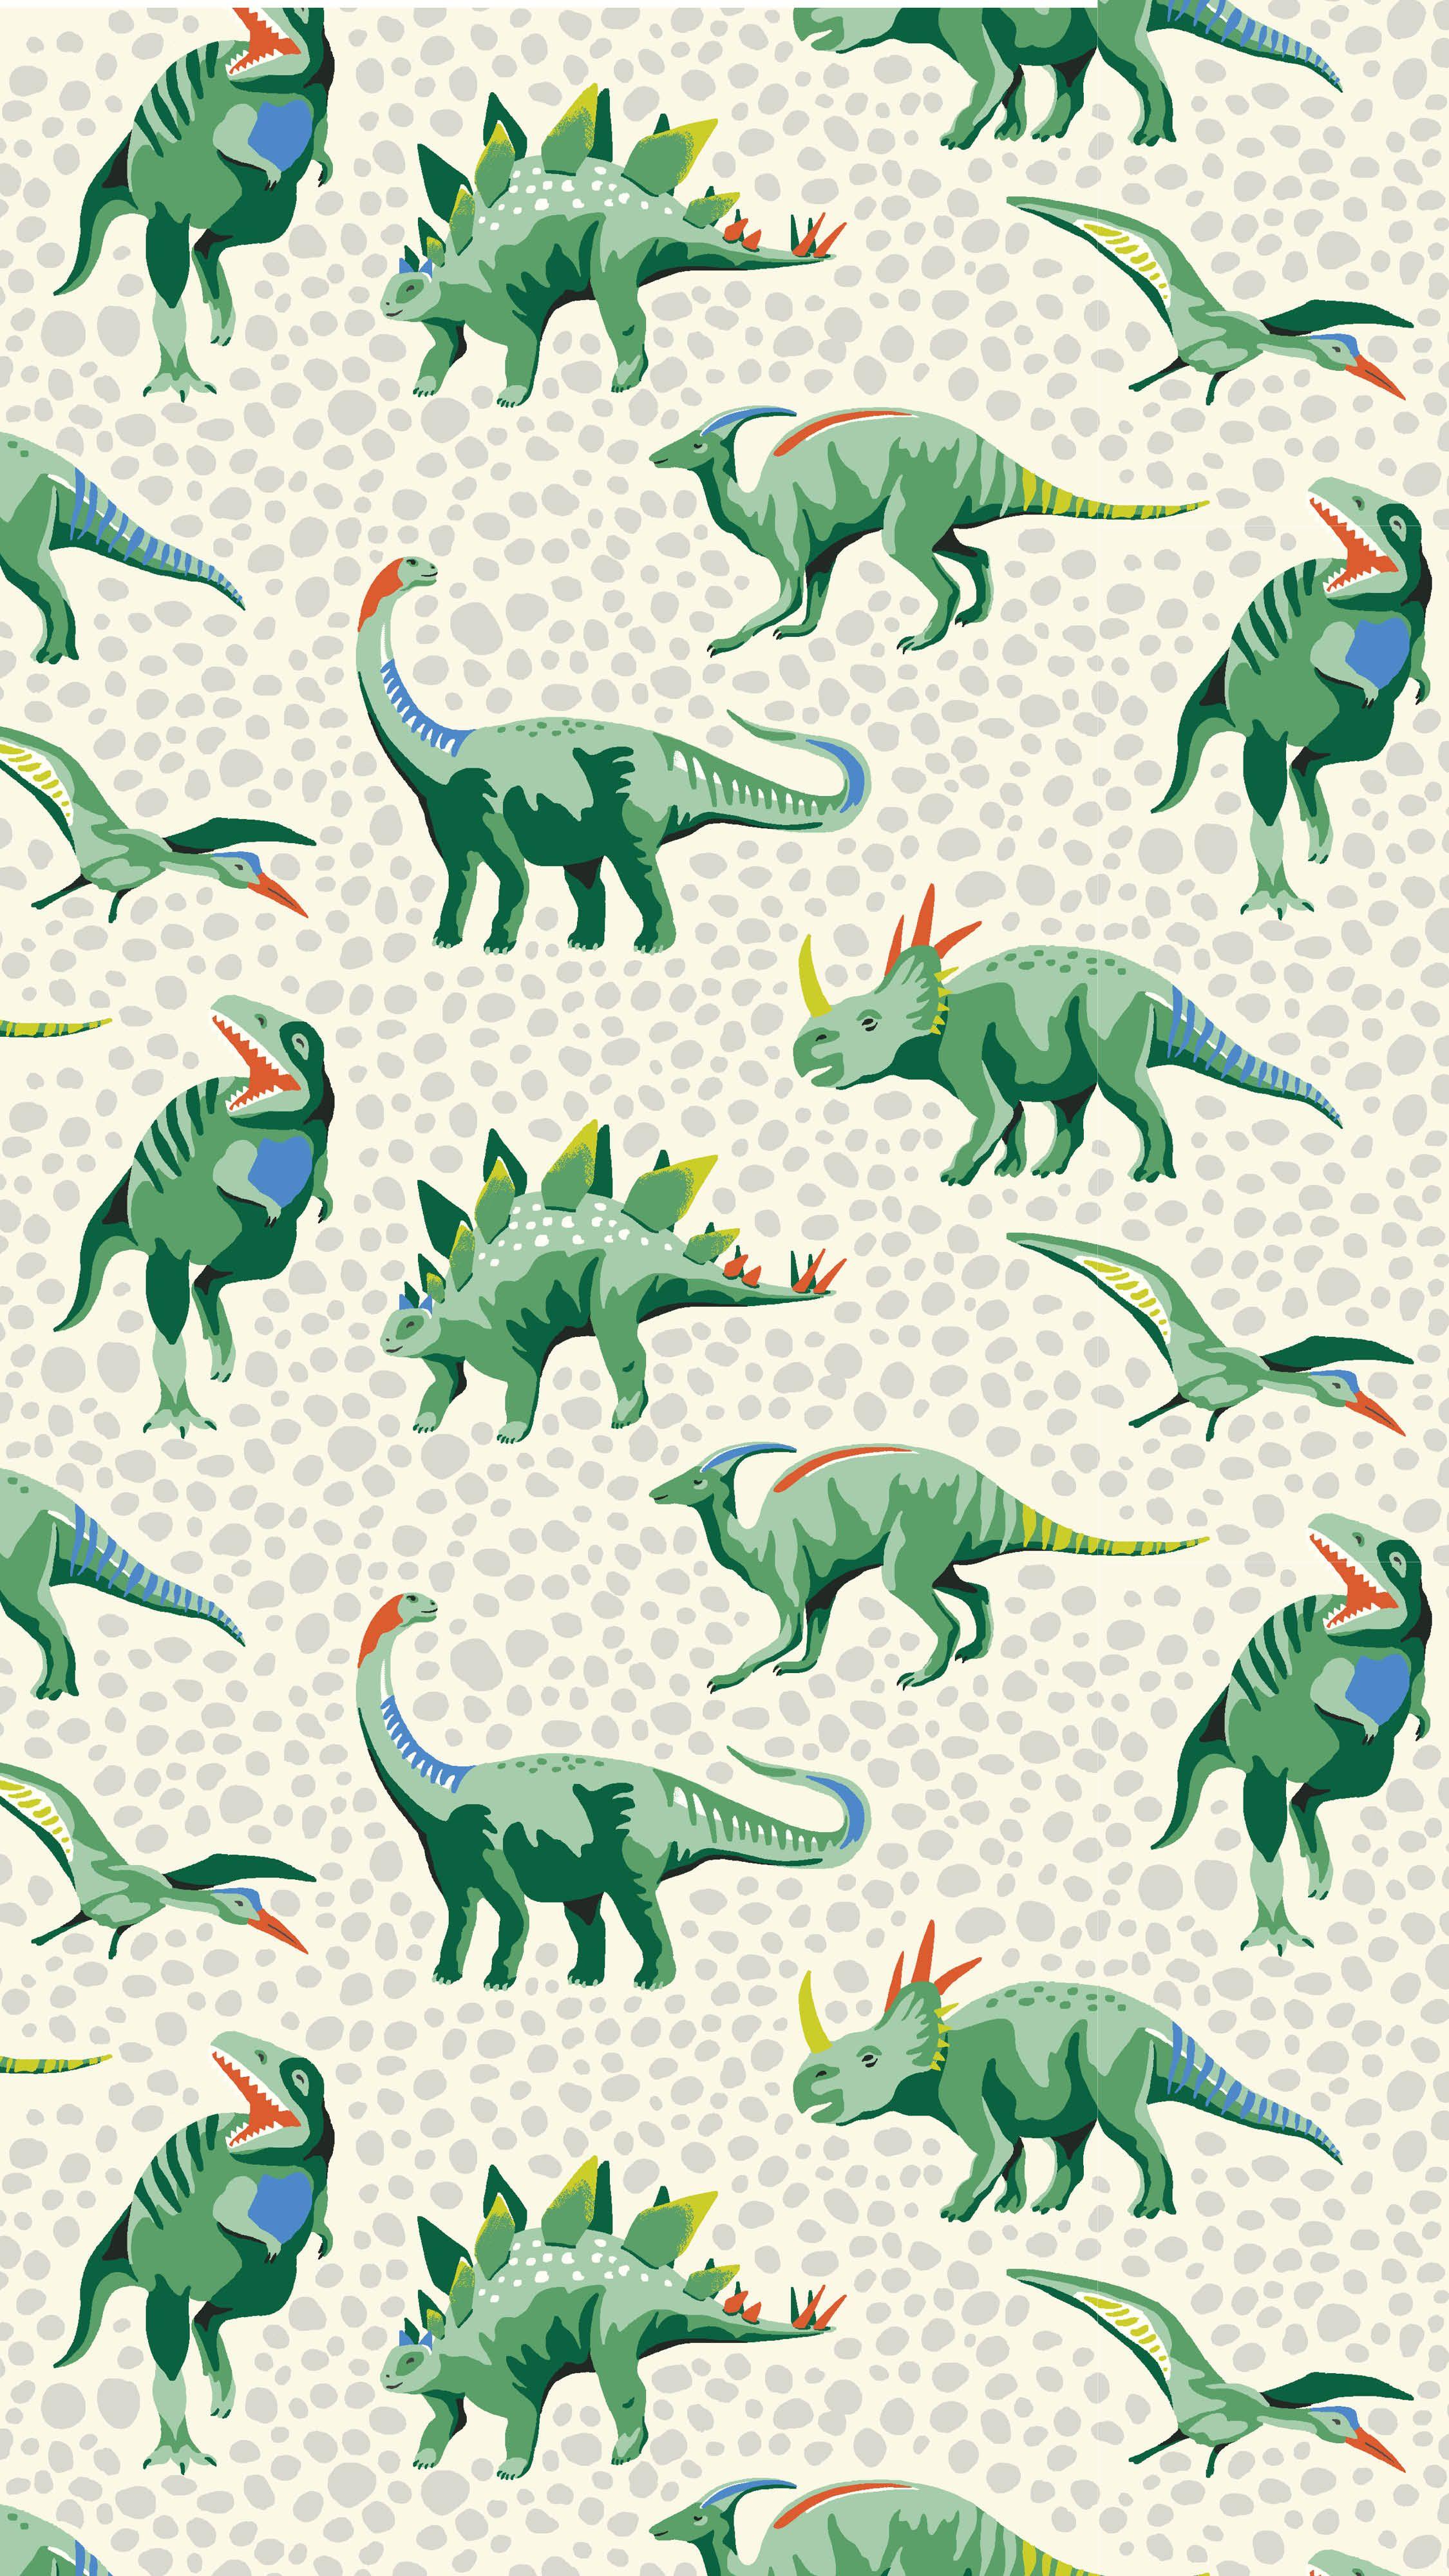 Jurassic Dinosaur Wallpaper Mobile Wallpaper Android Android Wallpaper